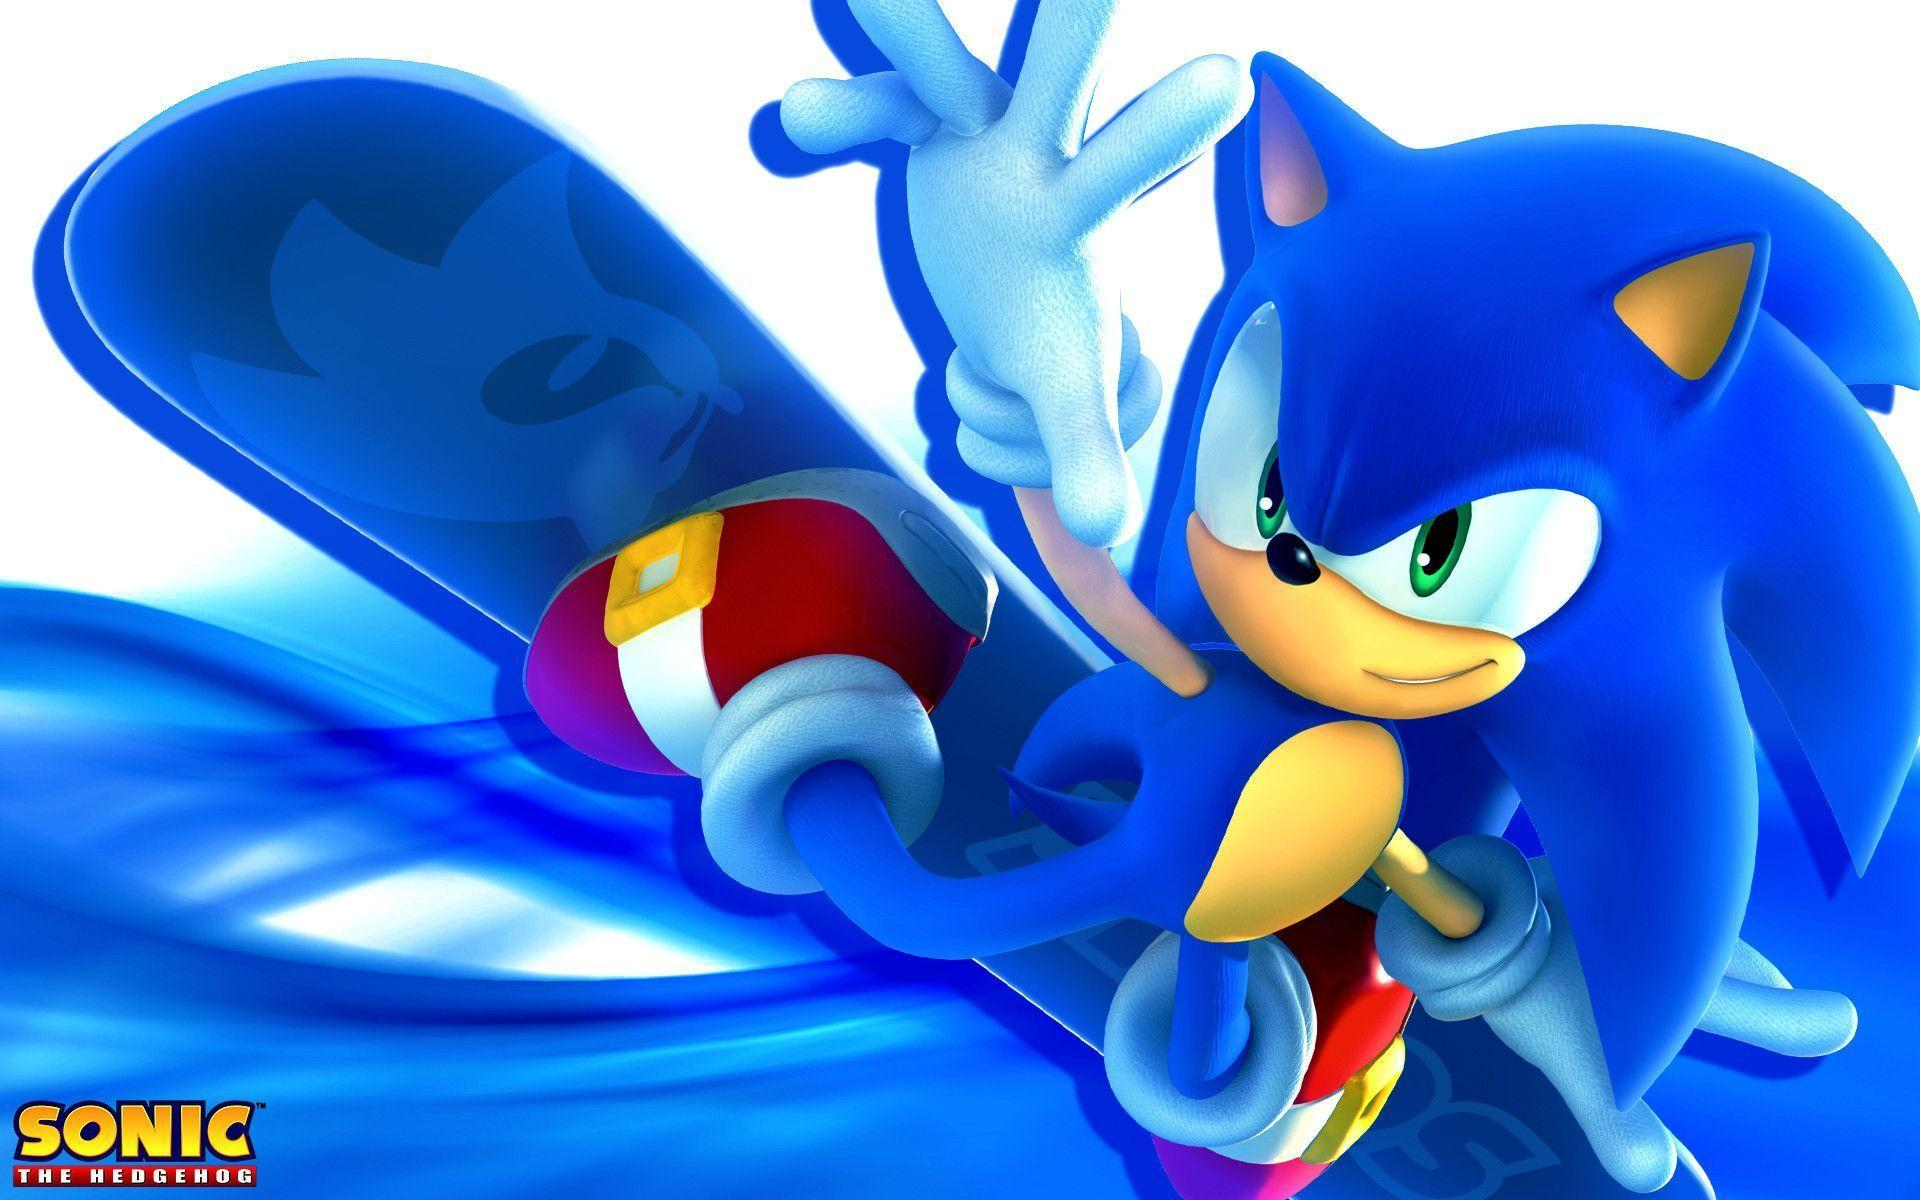 Sonic The Hedgehog Wallpapers 2015 Wallpaper Cave HD Wallpapers Download Free Images Wallpaper [1000image.com]